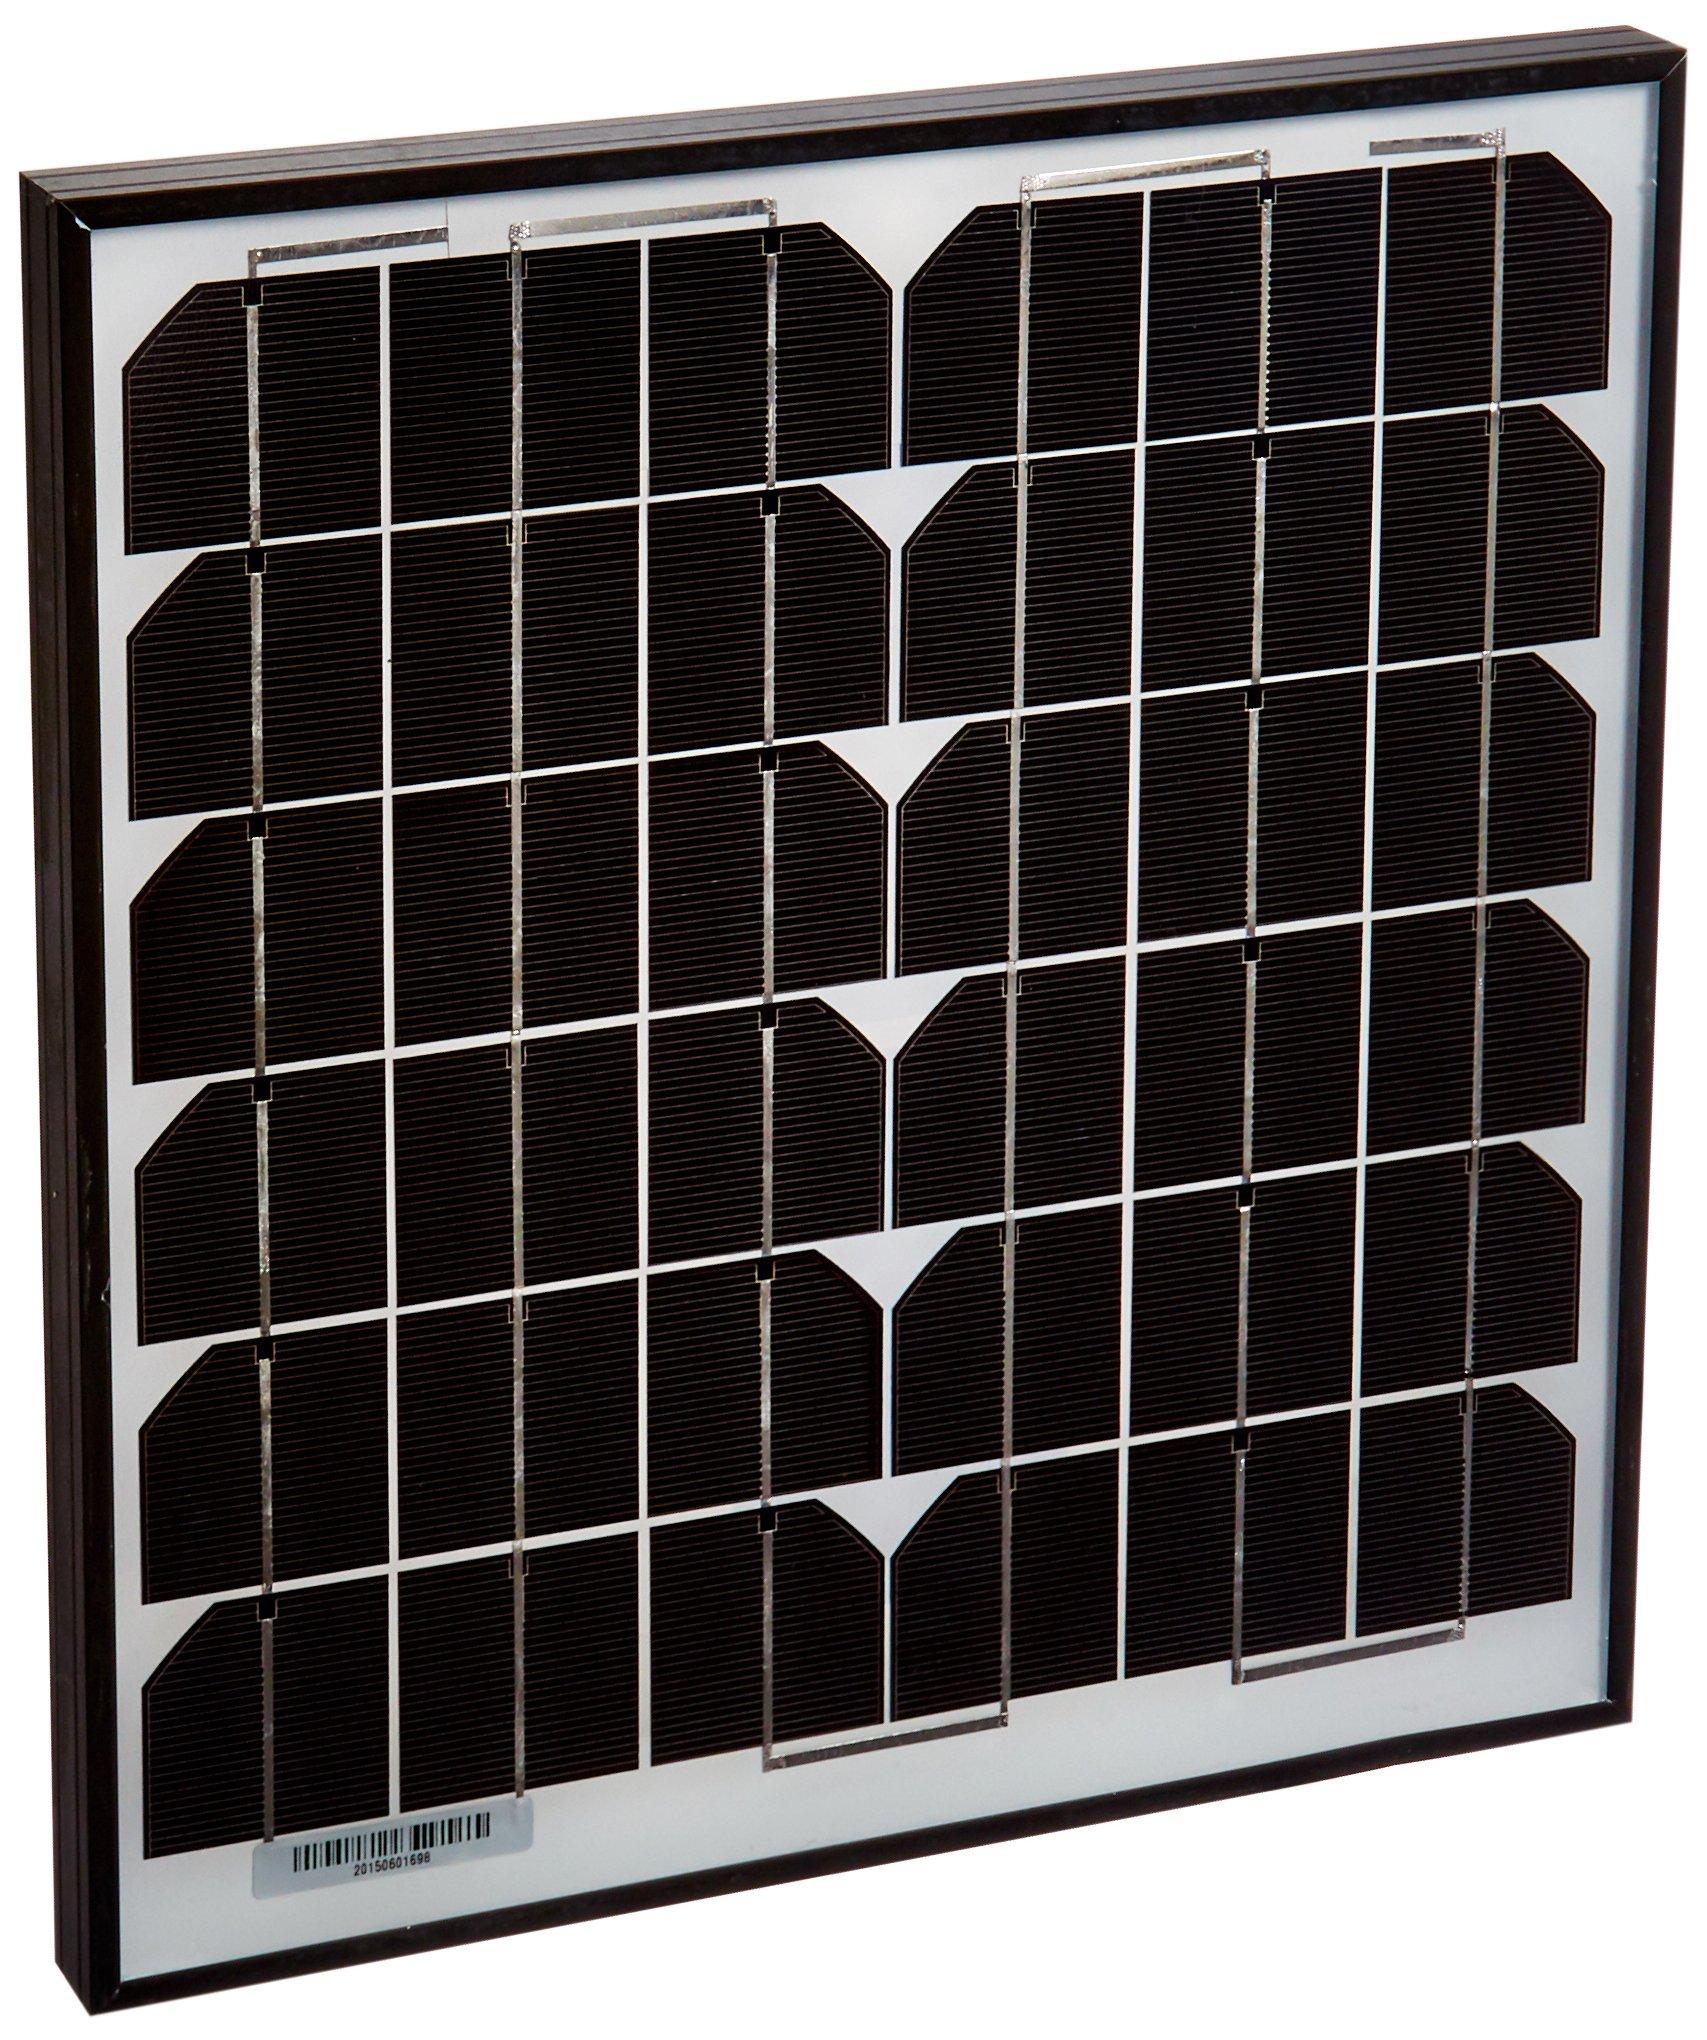 ALEKO Solar Panel Monocrystalline 15W for Any DC 12V Application (Gate Opener, Portable Charging System, Etc.)